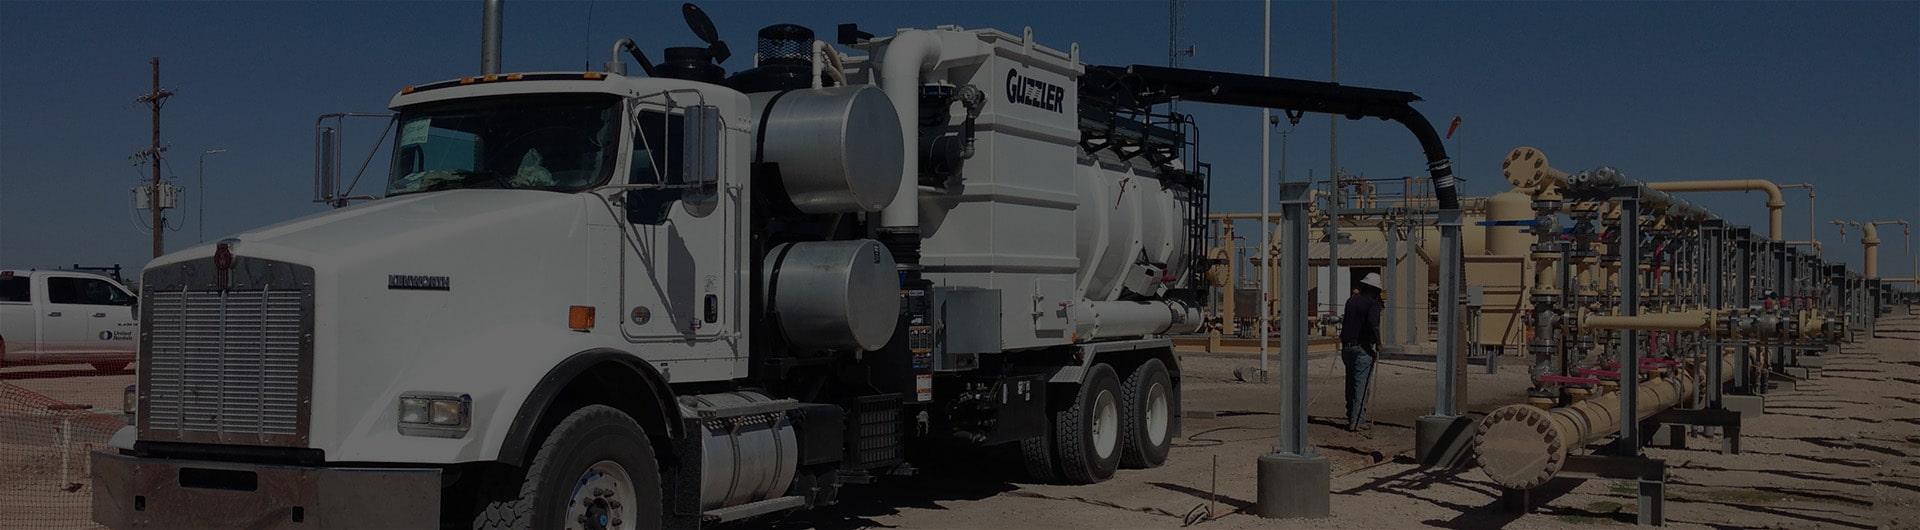 Your Industrial Equipment Source